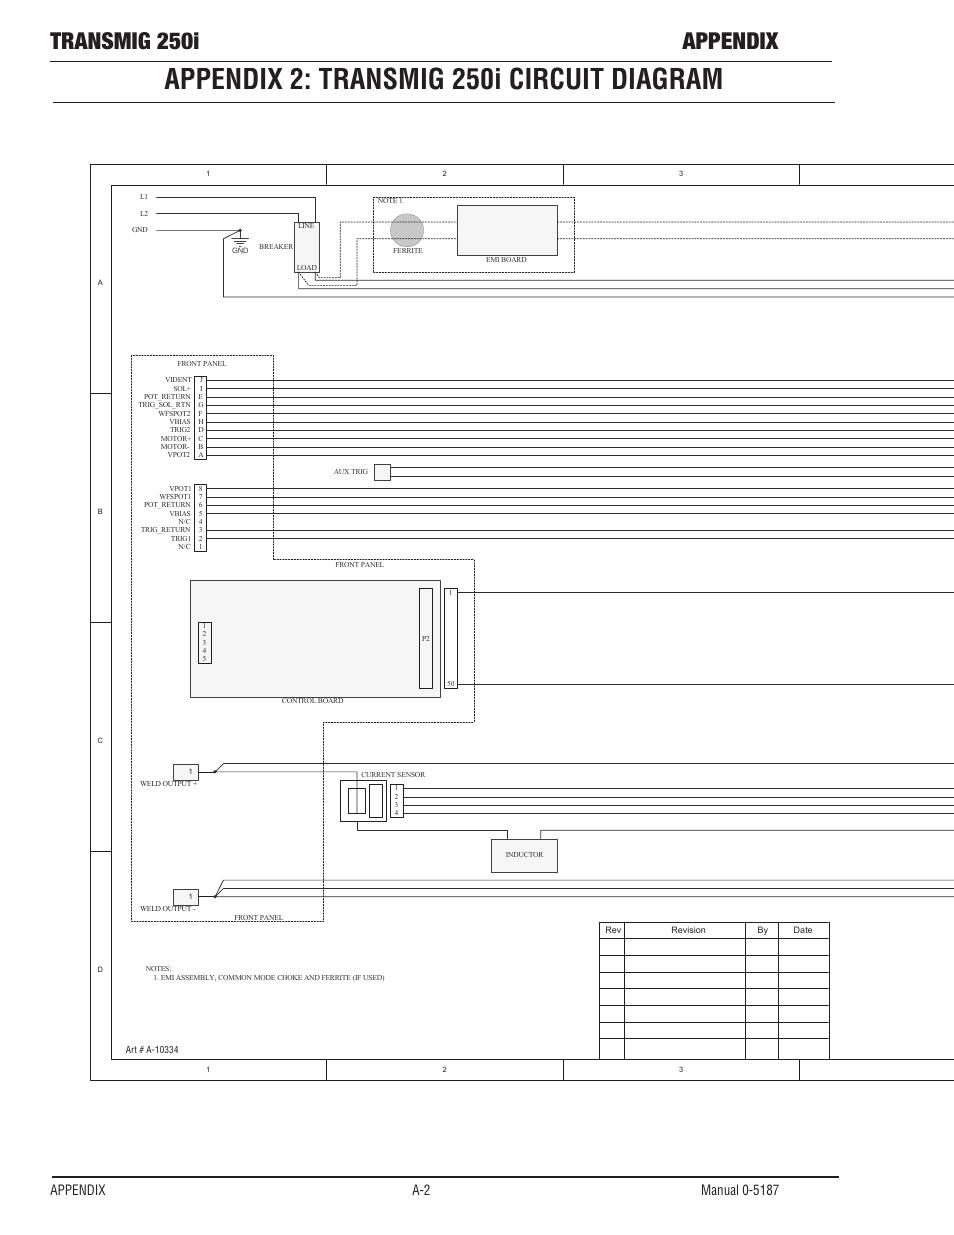 medium resolution of appendix 2 transmig 250i circuit diagram transmig 250i appendix sch sys